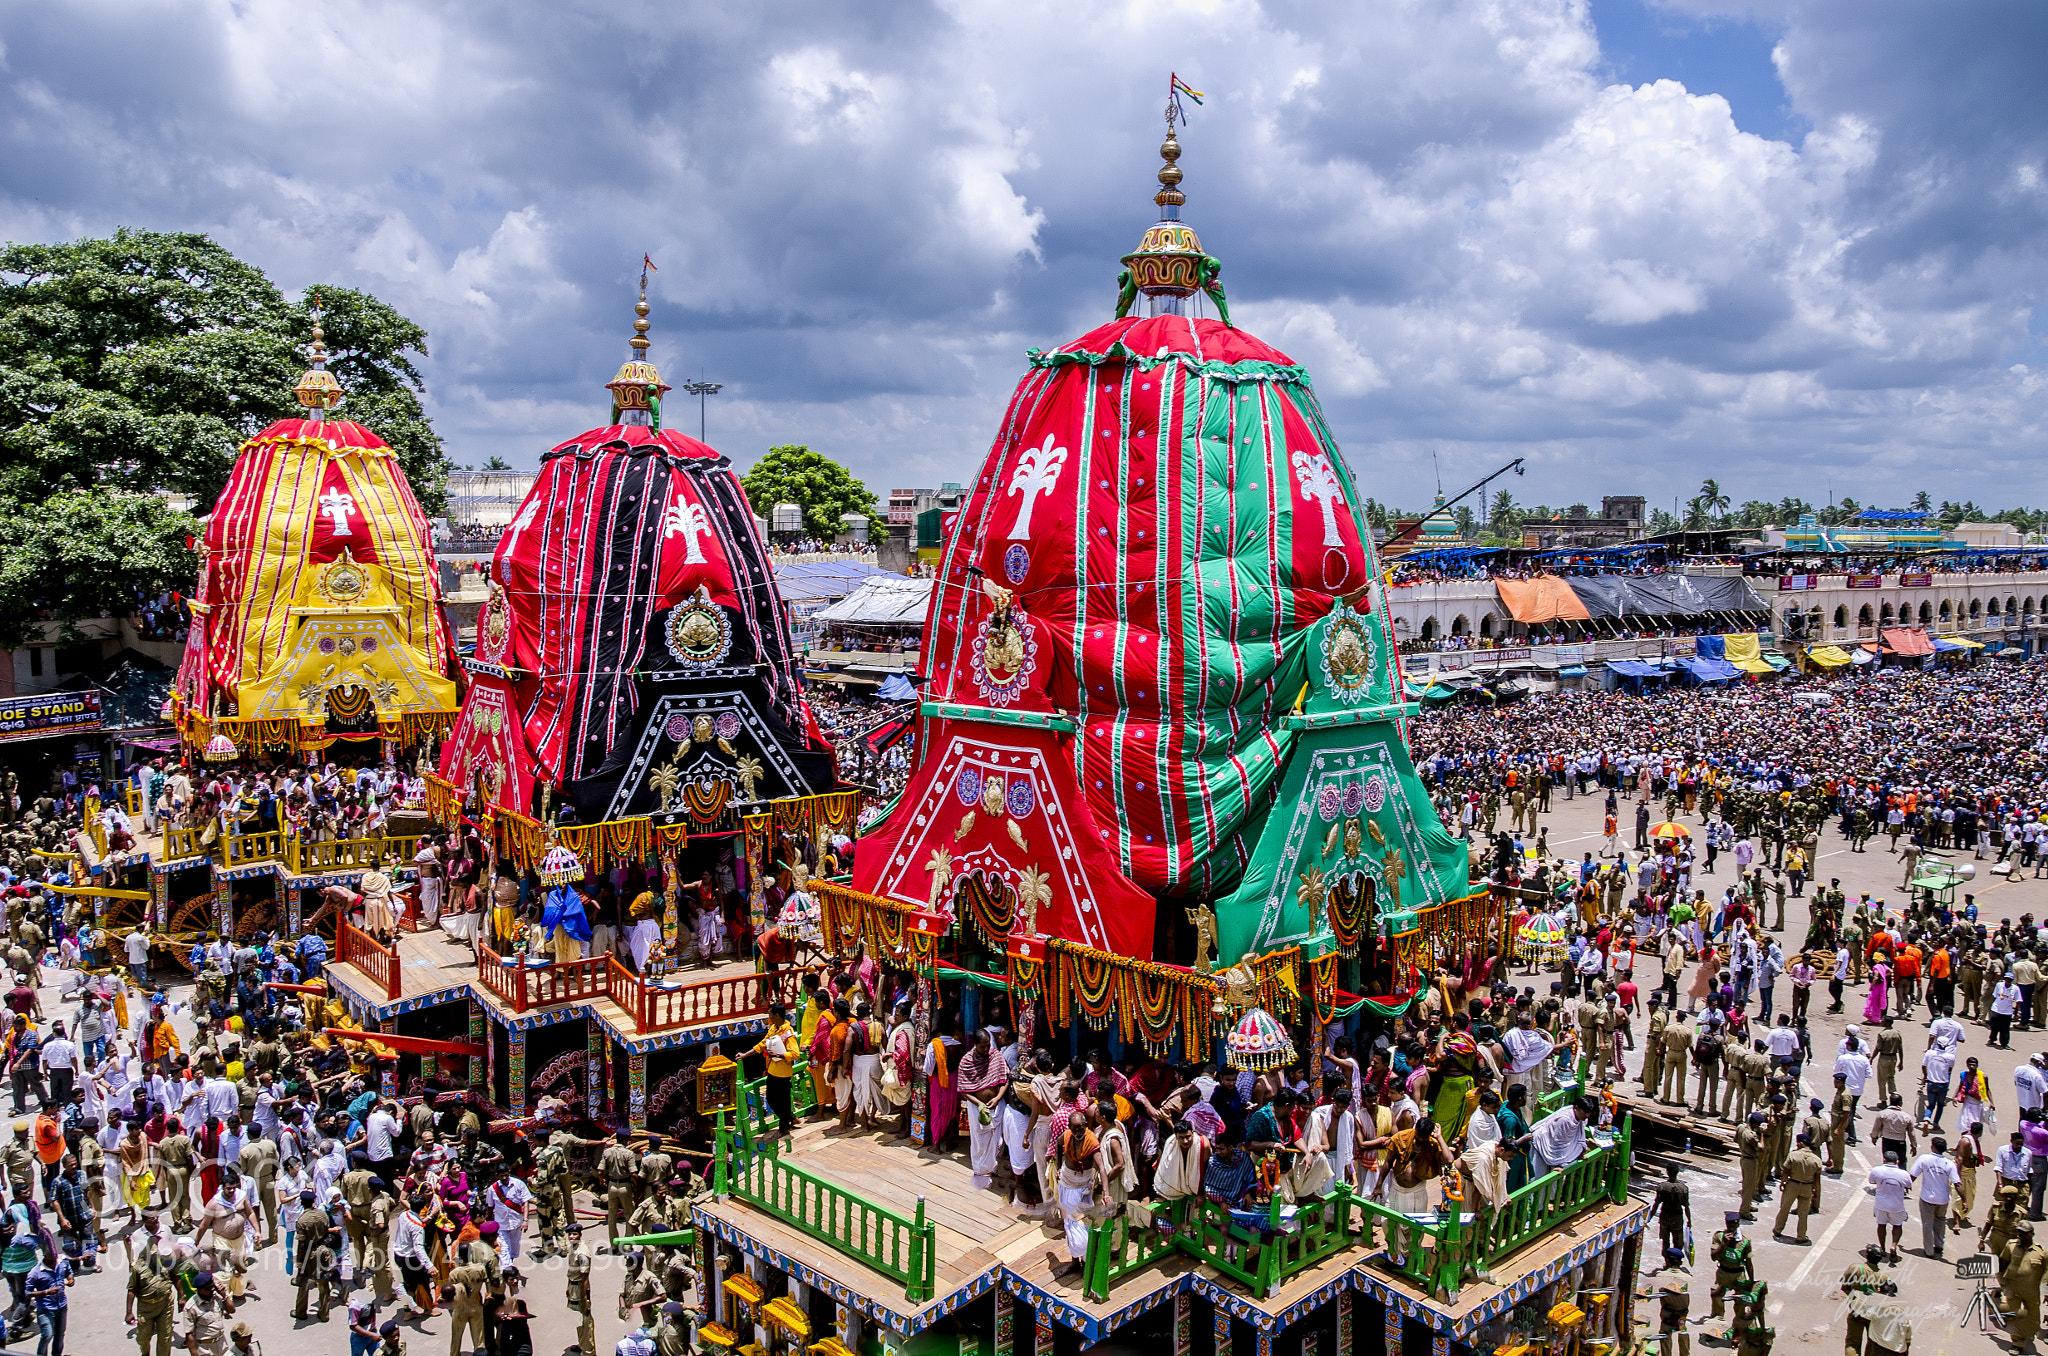 Photograph Rath Yatra (Car Festival, Puri) by Satya M on 500px